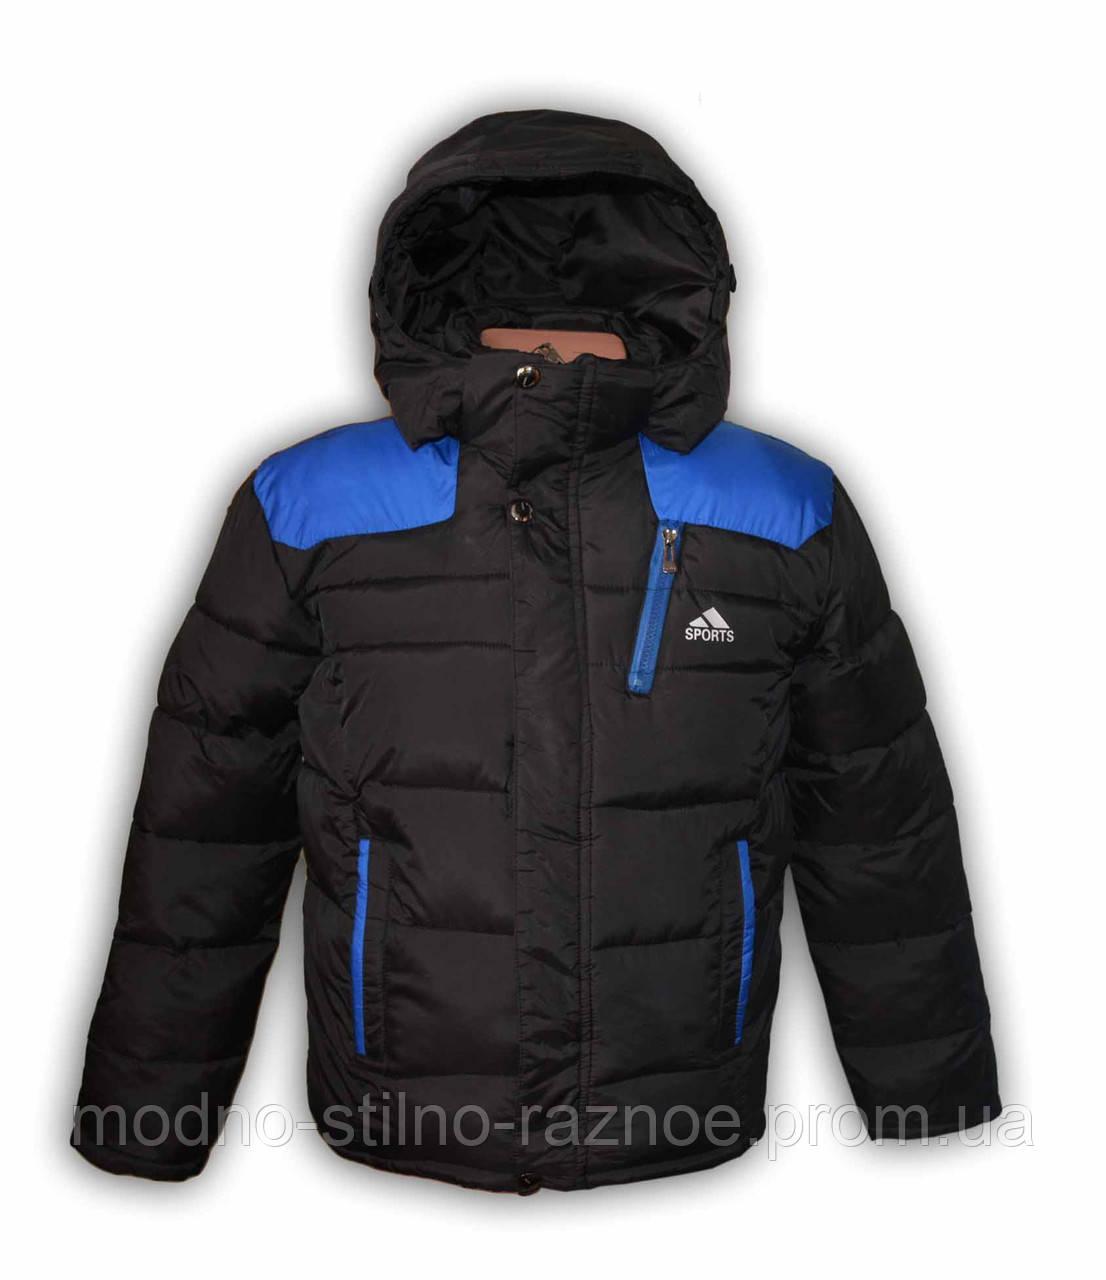 Куртка зимняя на мальчика. 140-146